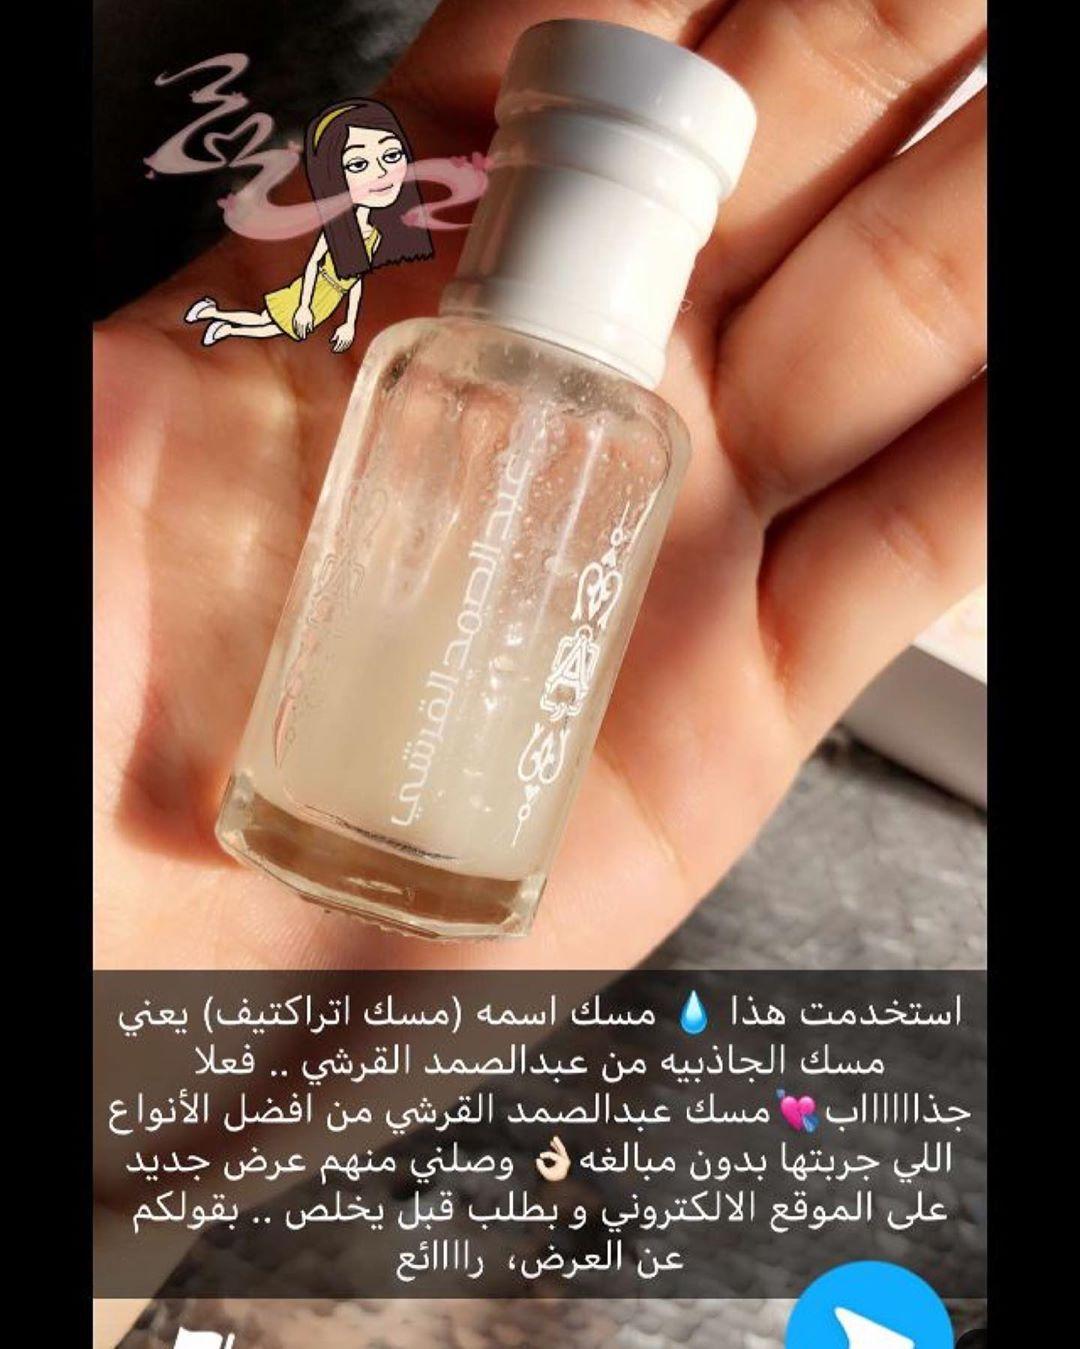 مسك اتراكتيف من عبدالصمد القرشي Beauty Perfume Pretty Skin Care Perfume Lover